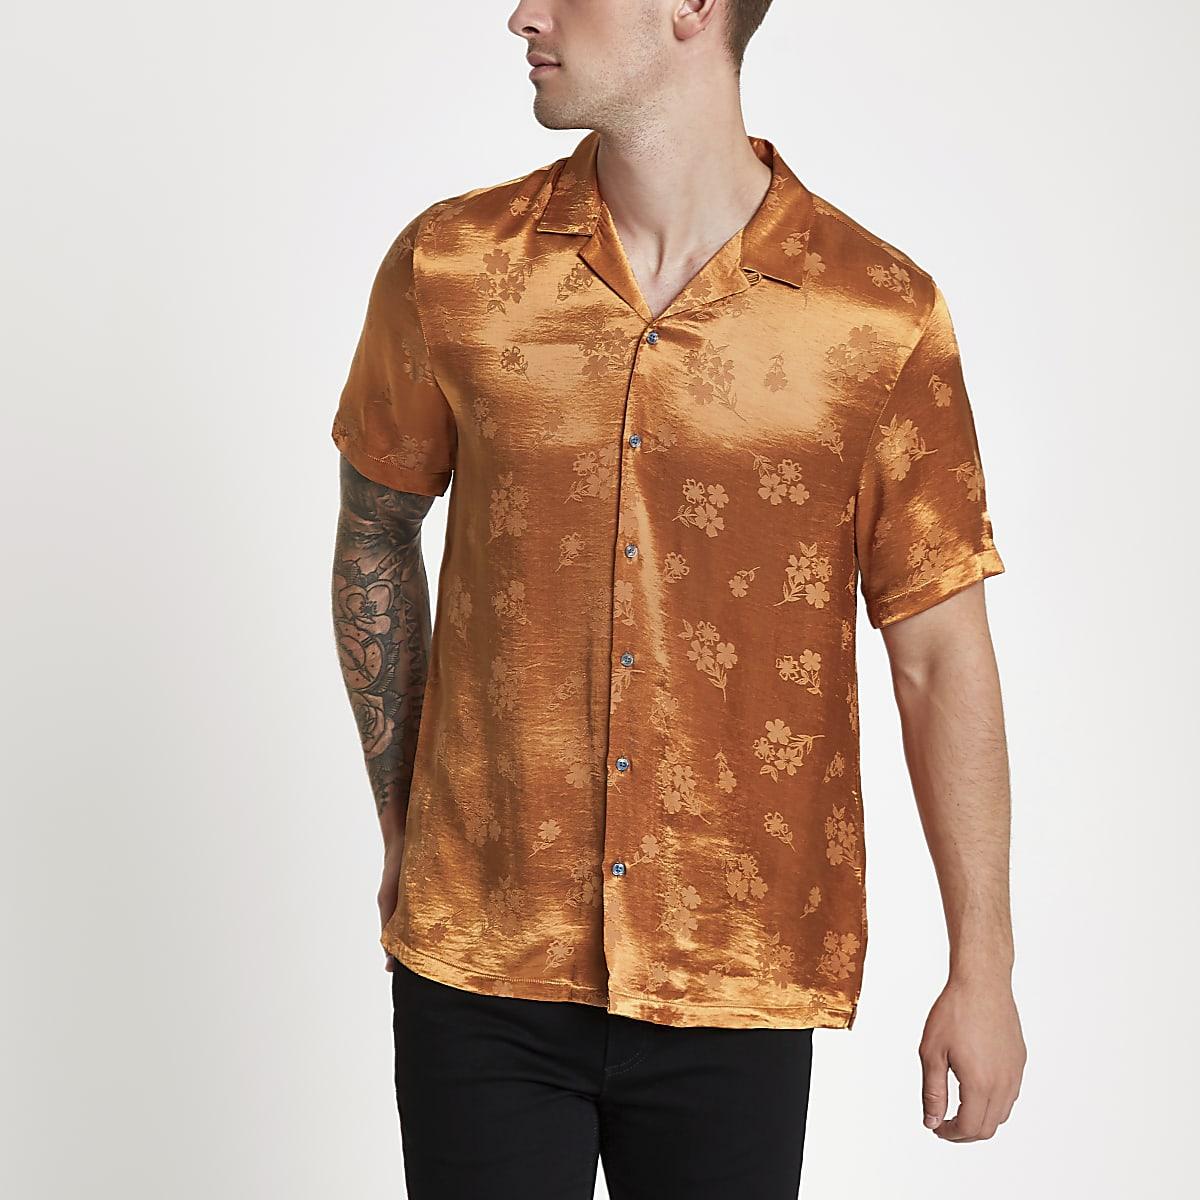 616d980bcee Orange jacquard floral revere shirt - Short Sleeve Shirts - Shirts - men